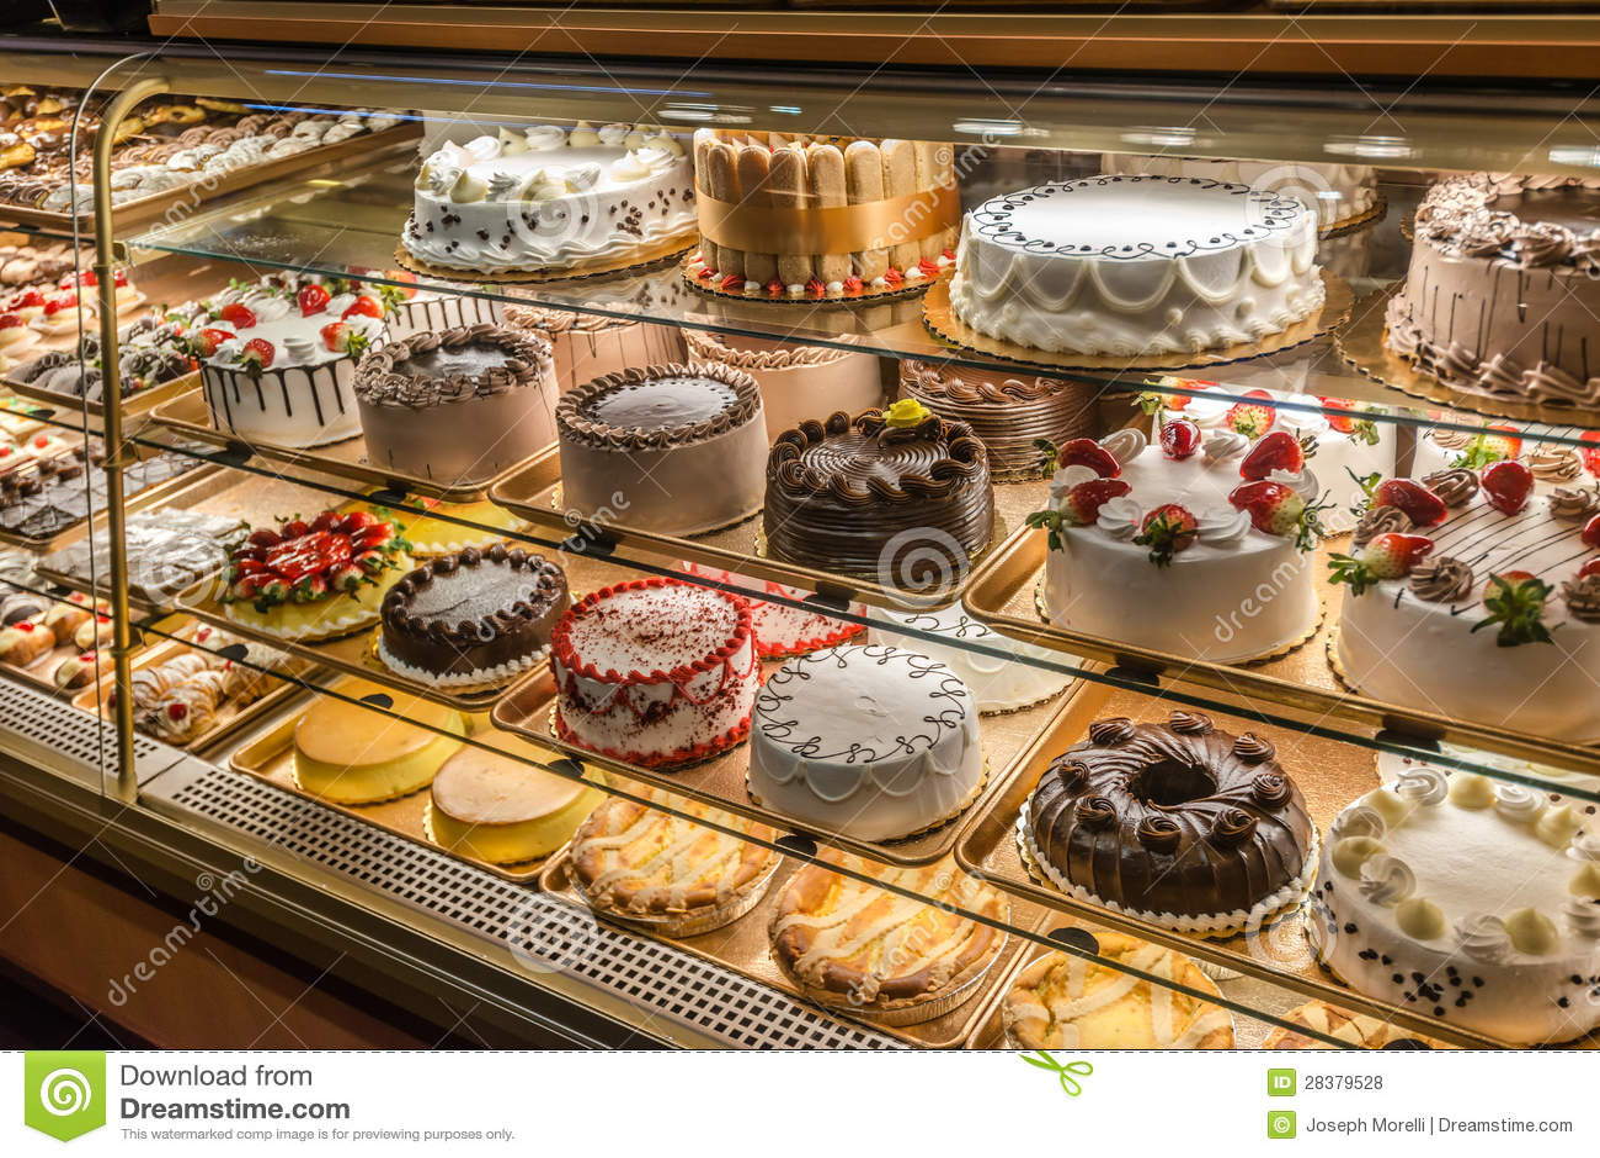 Bakery Business Plan Sample Financial Plan Bplans Italian Bakery Royalty Free Stock Photos Image 28379528